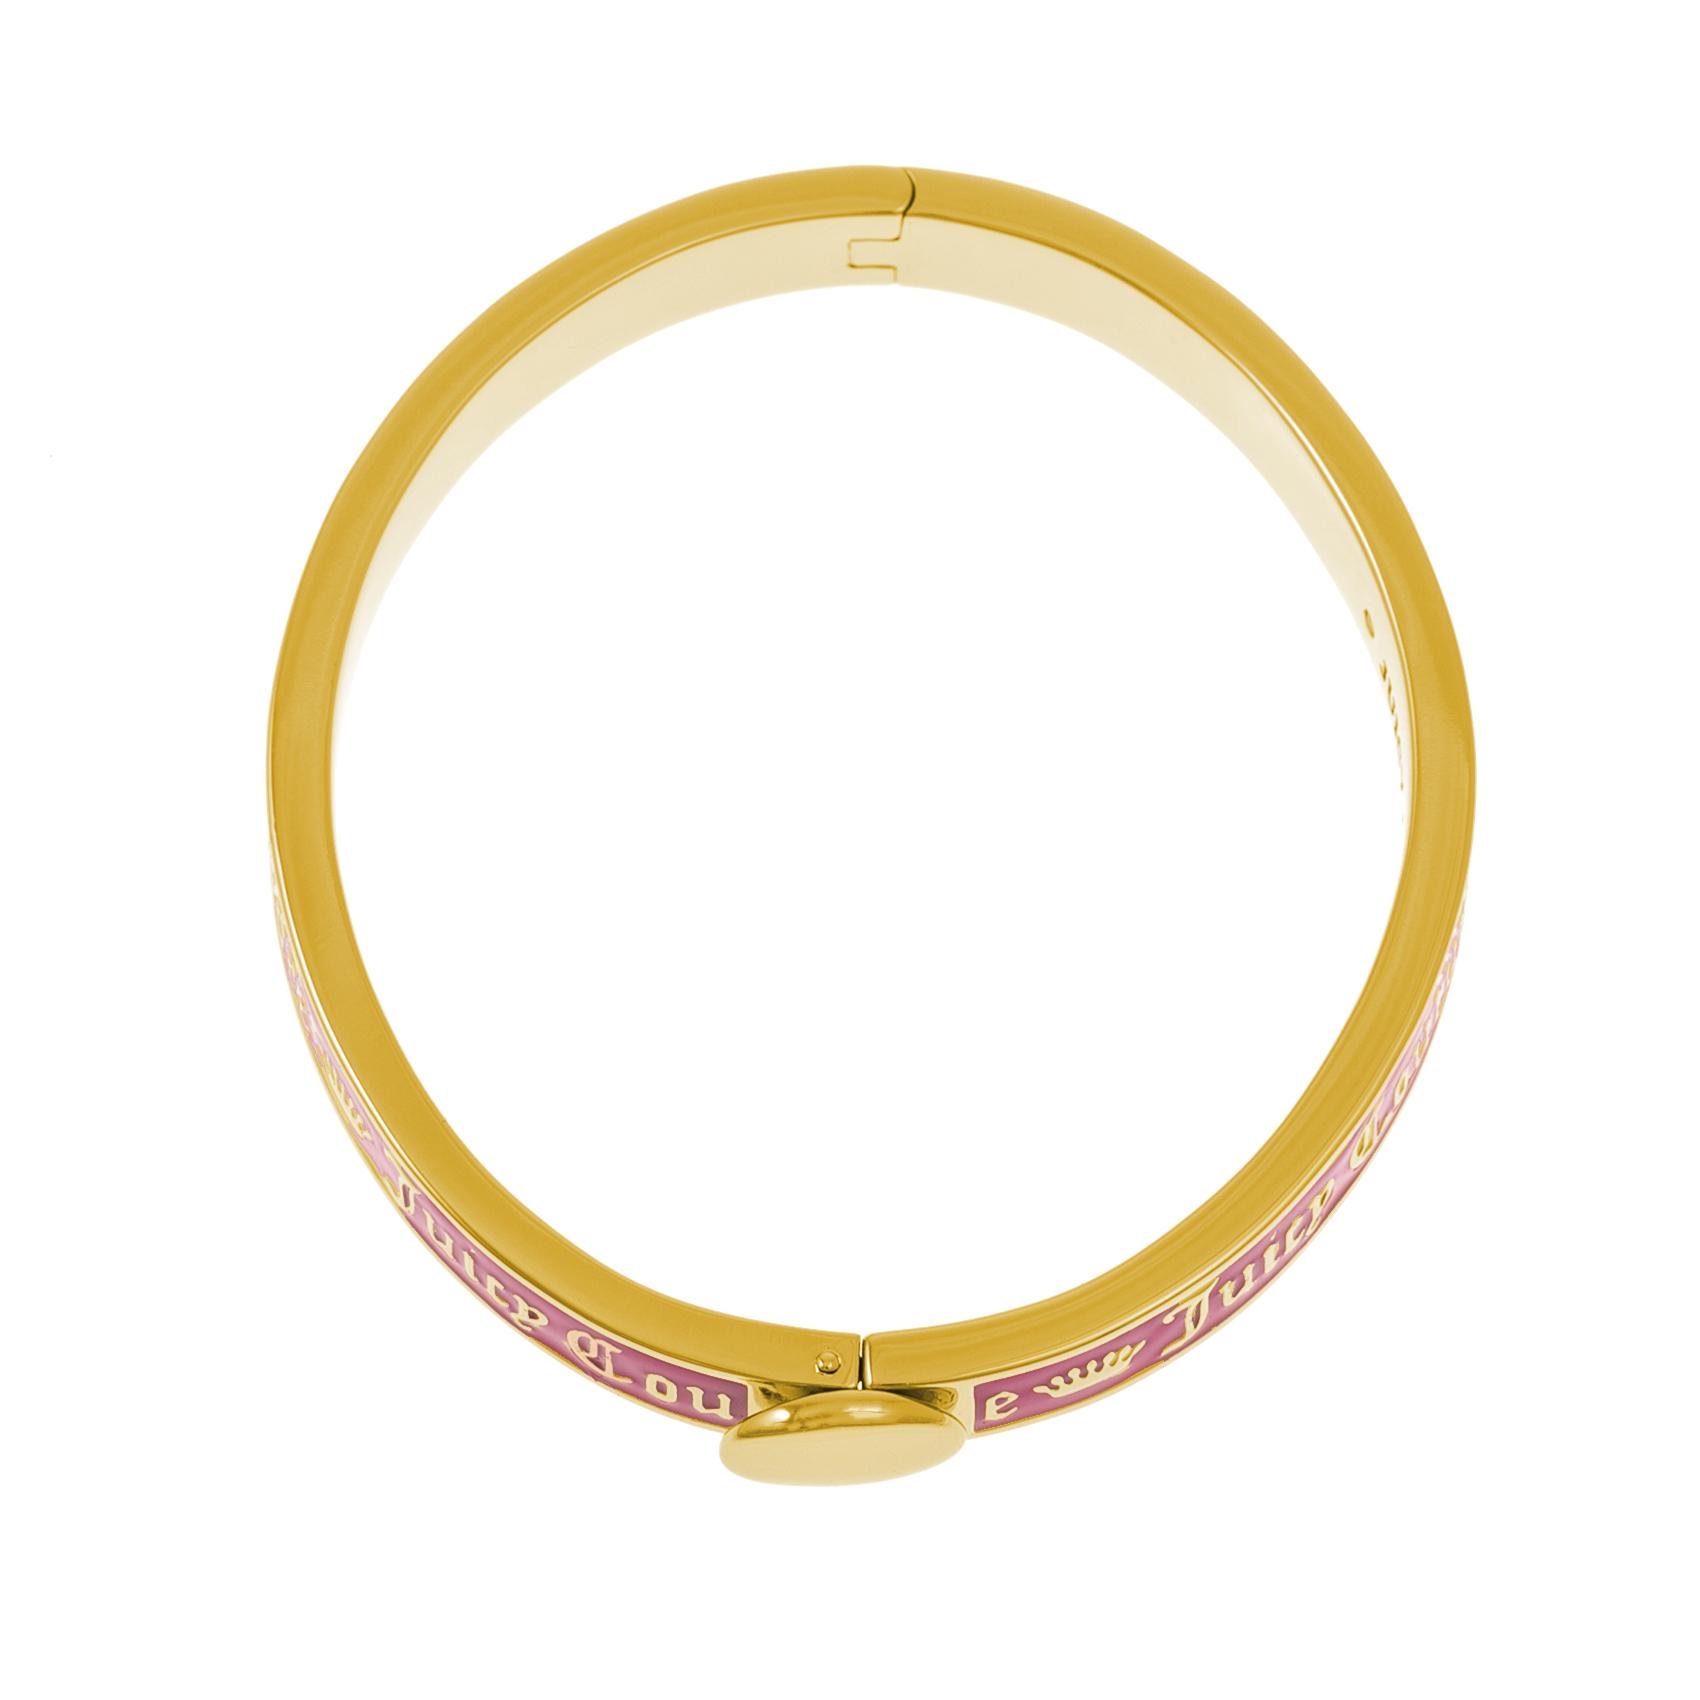 JUICY COUTURE - Βραχιόλι JUICY COUTURE ροζ-χρυσό γυναικεία αξεσουάρ κοσμήματα βραχιόλια